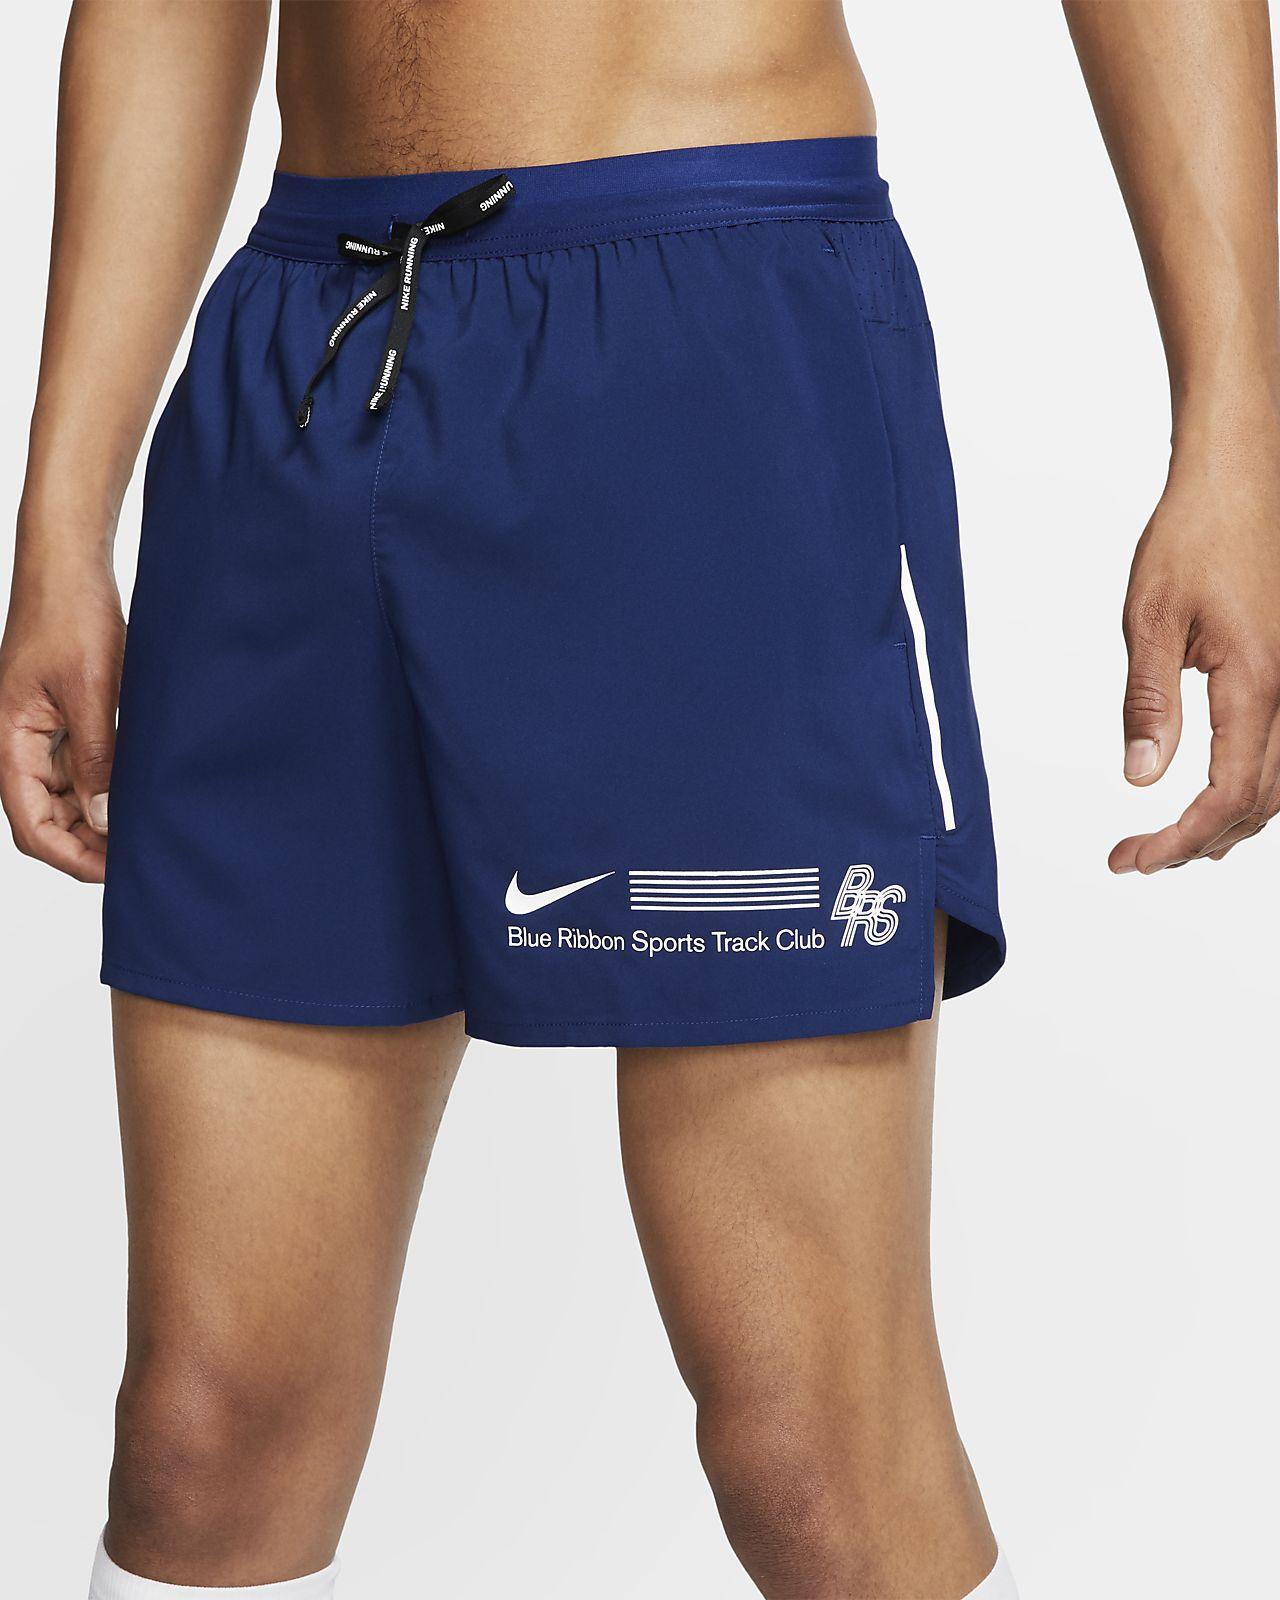 319749c36 ... Nike Flex Stride BRS Pantalón corto de running de 13 cm con forro -  Hombre